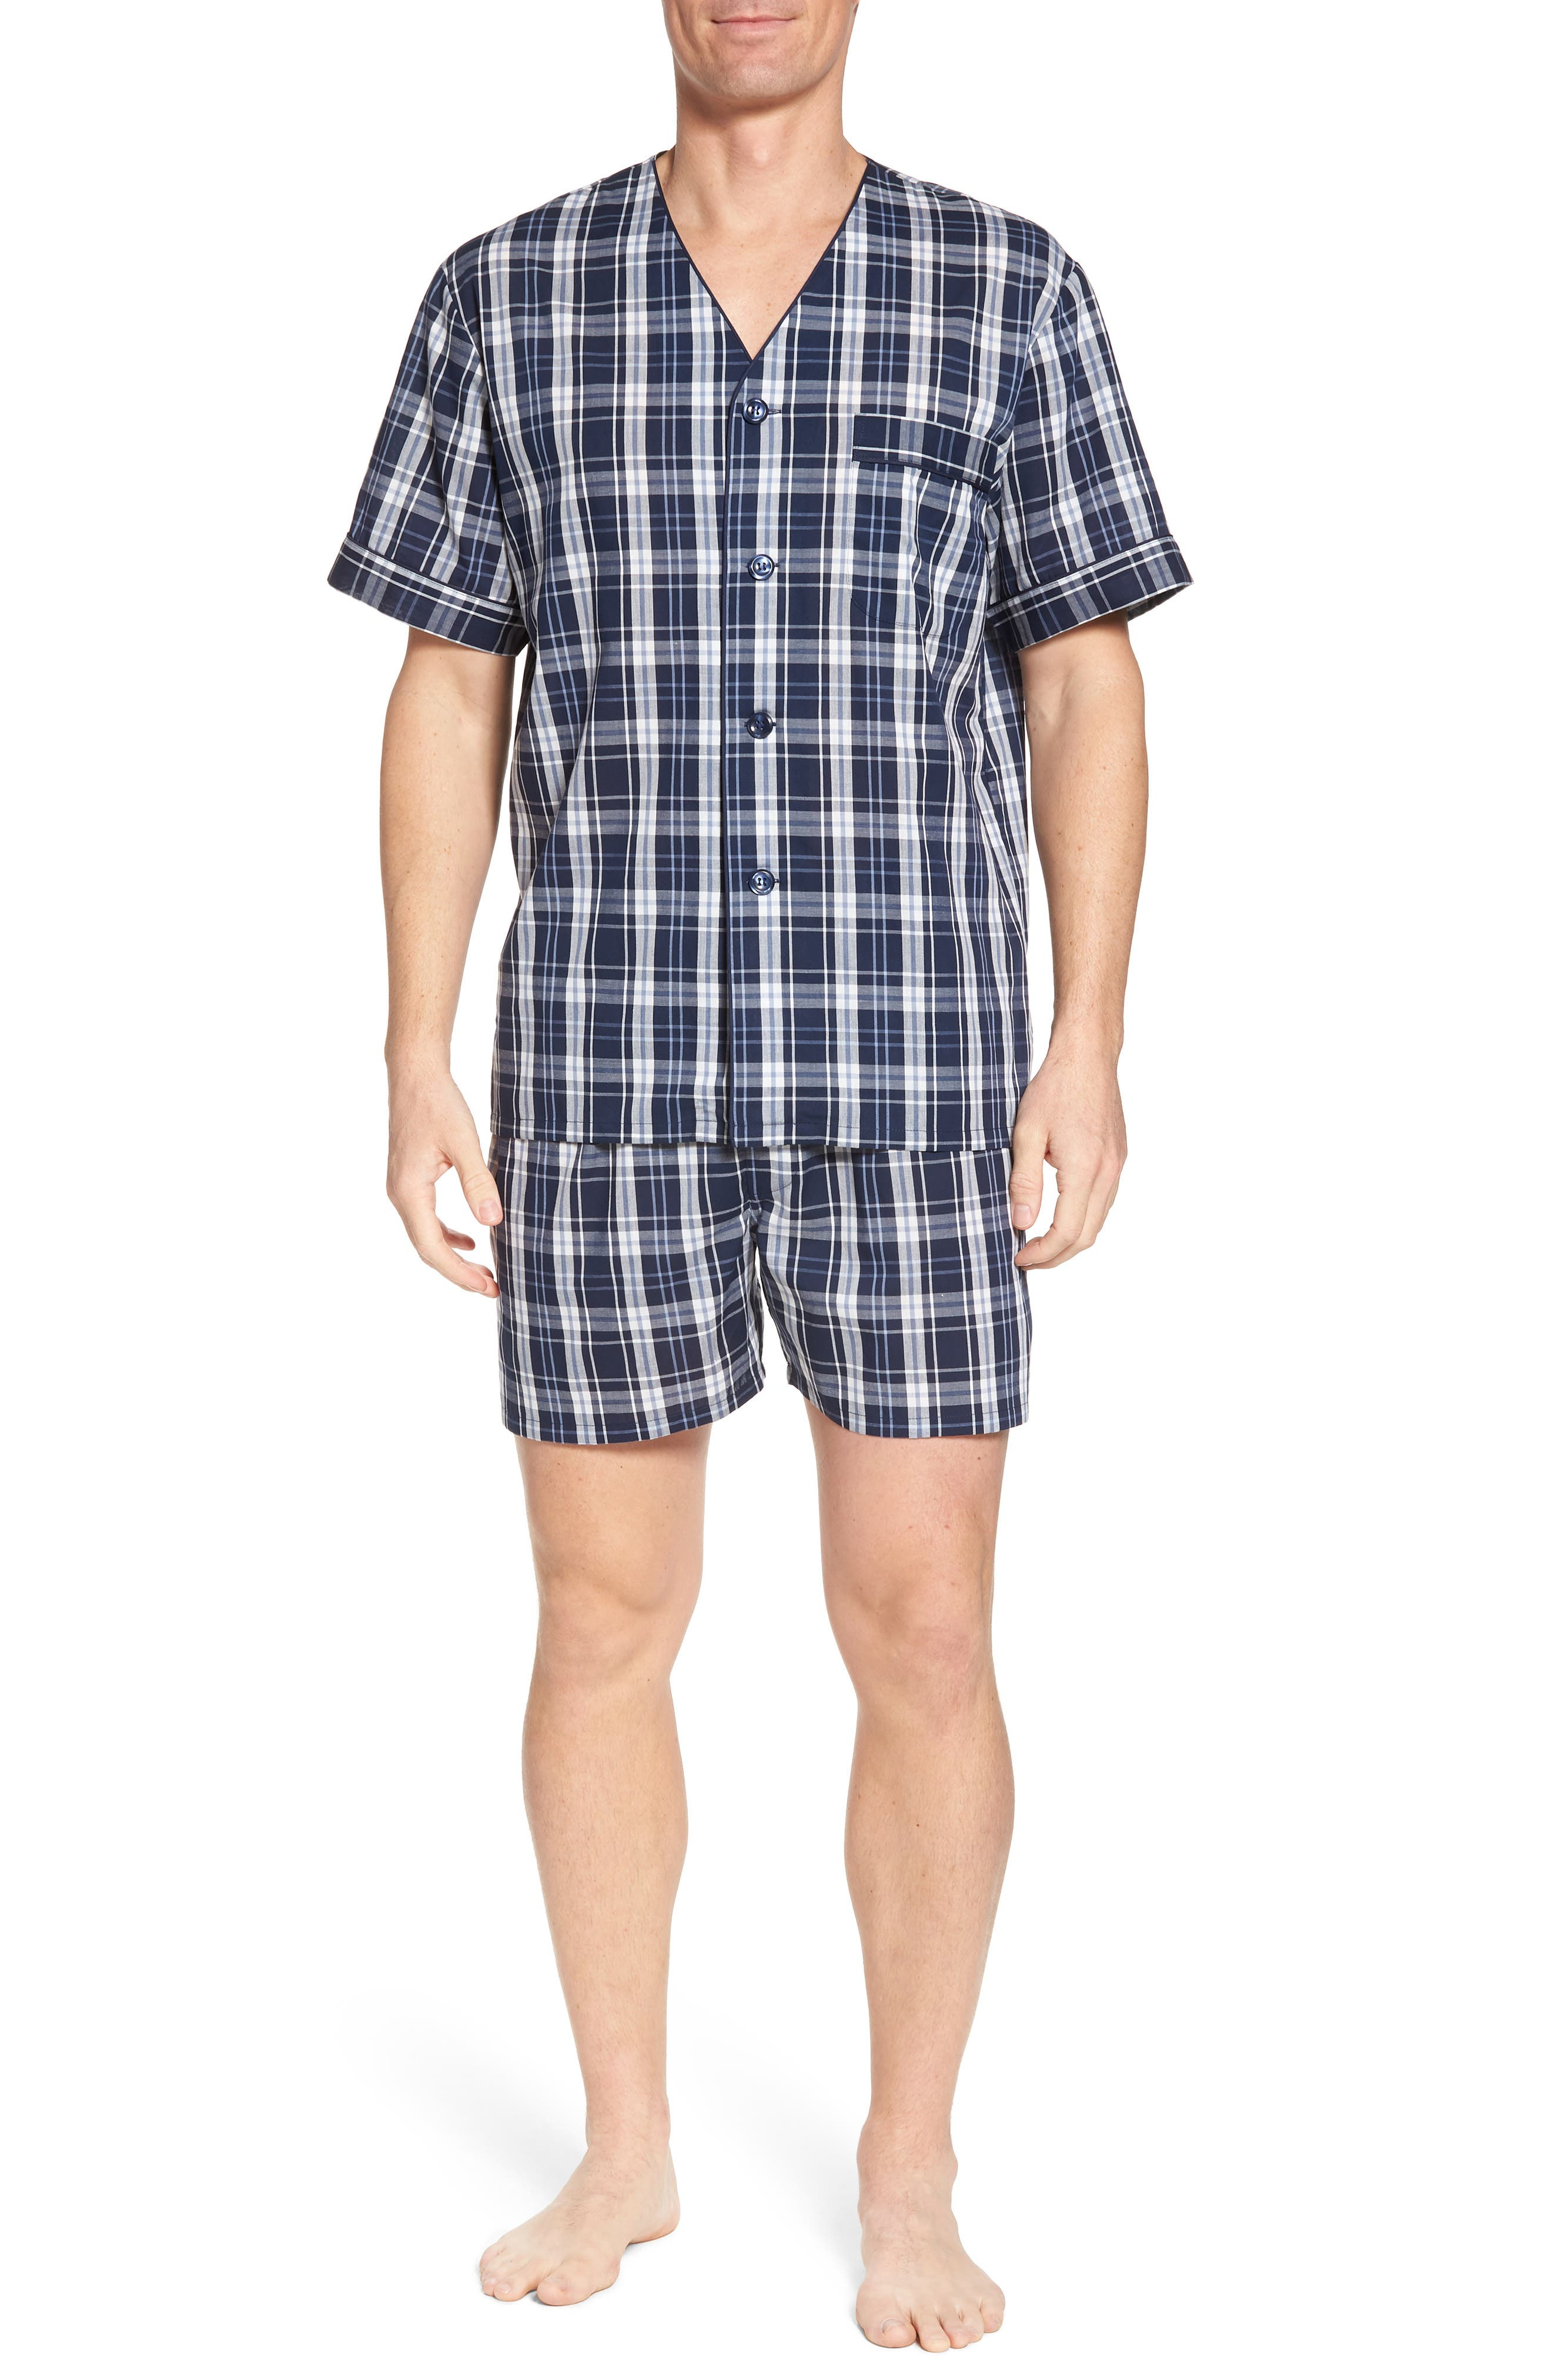 Carefree Shorty Pajama Set,                         Main,                         color, 400